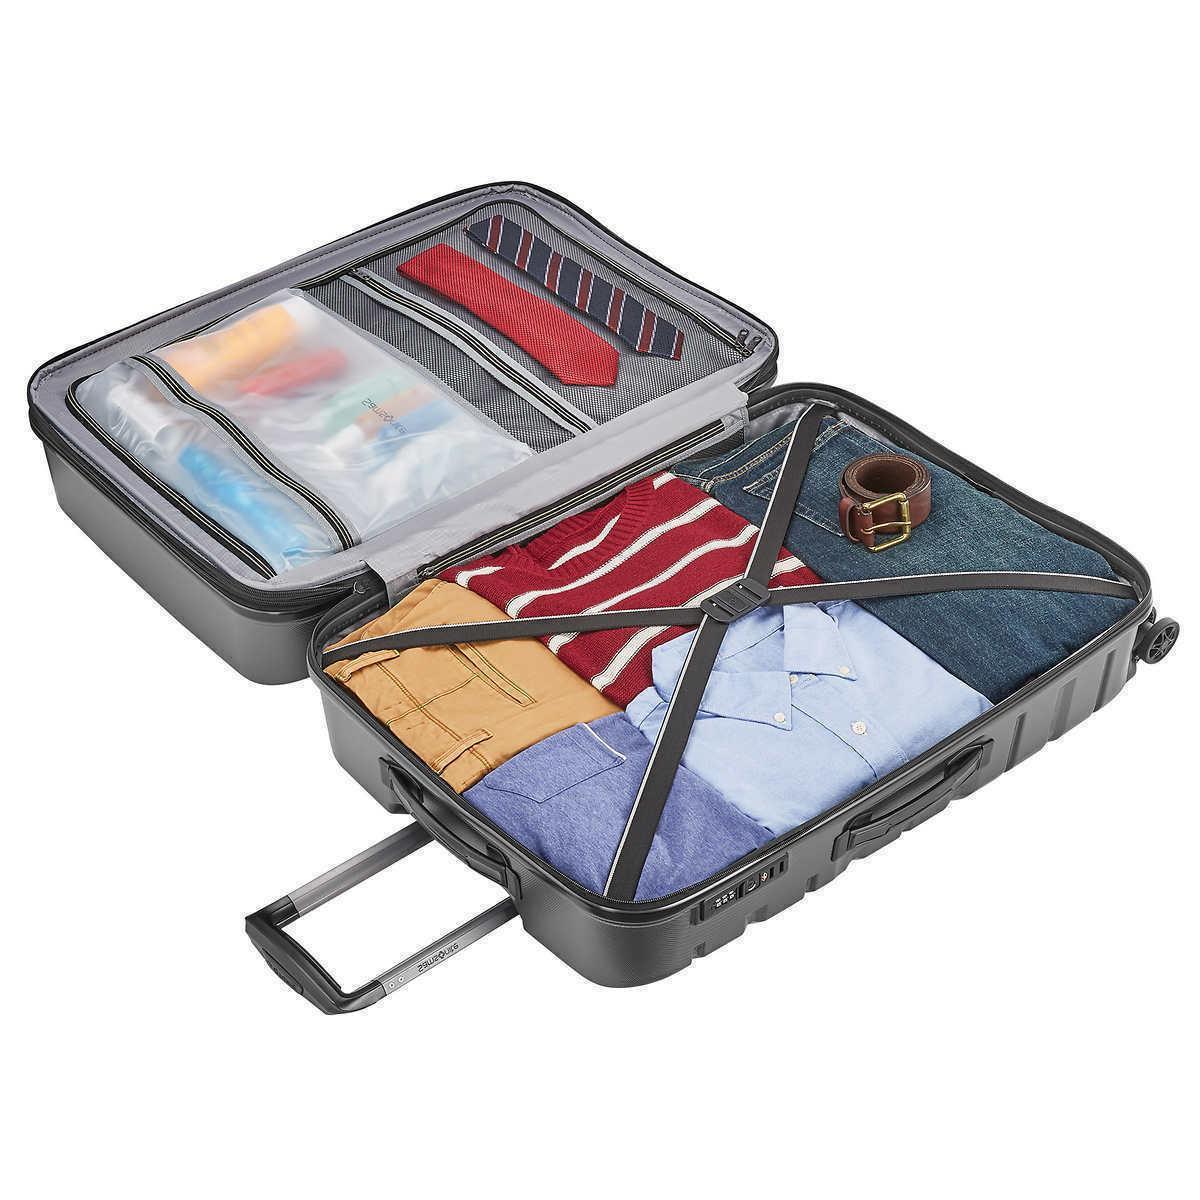 "Samsonite Tech 2.0 pieces 28"" Travel Luggage"